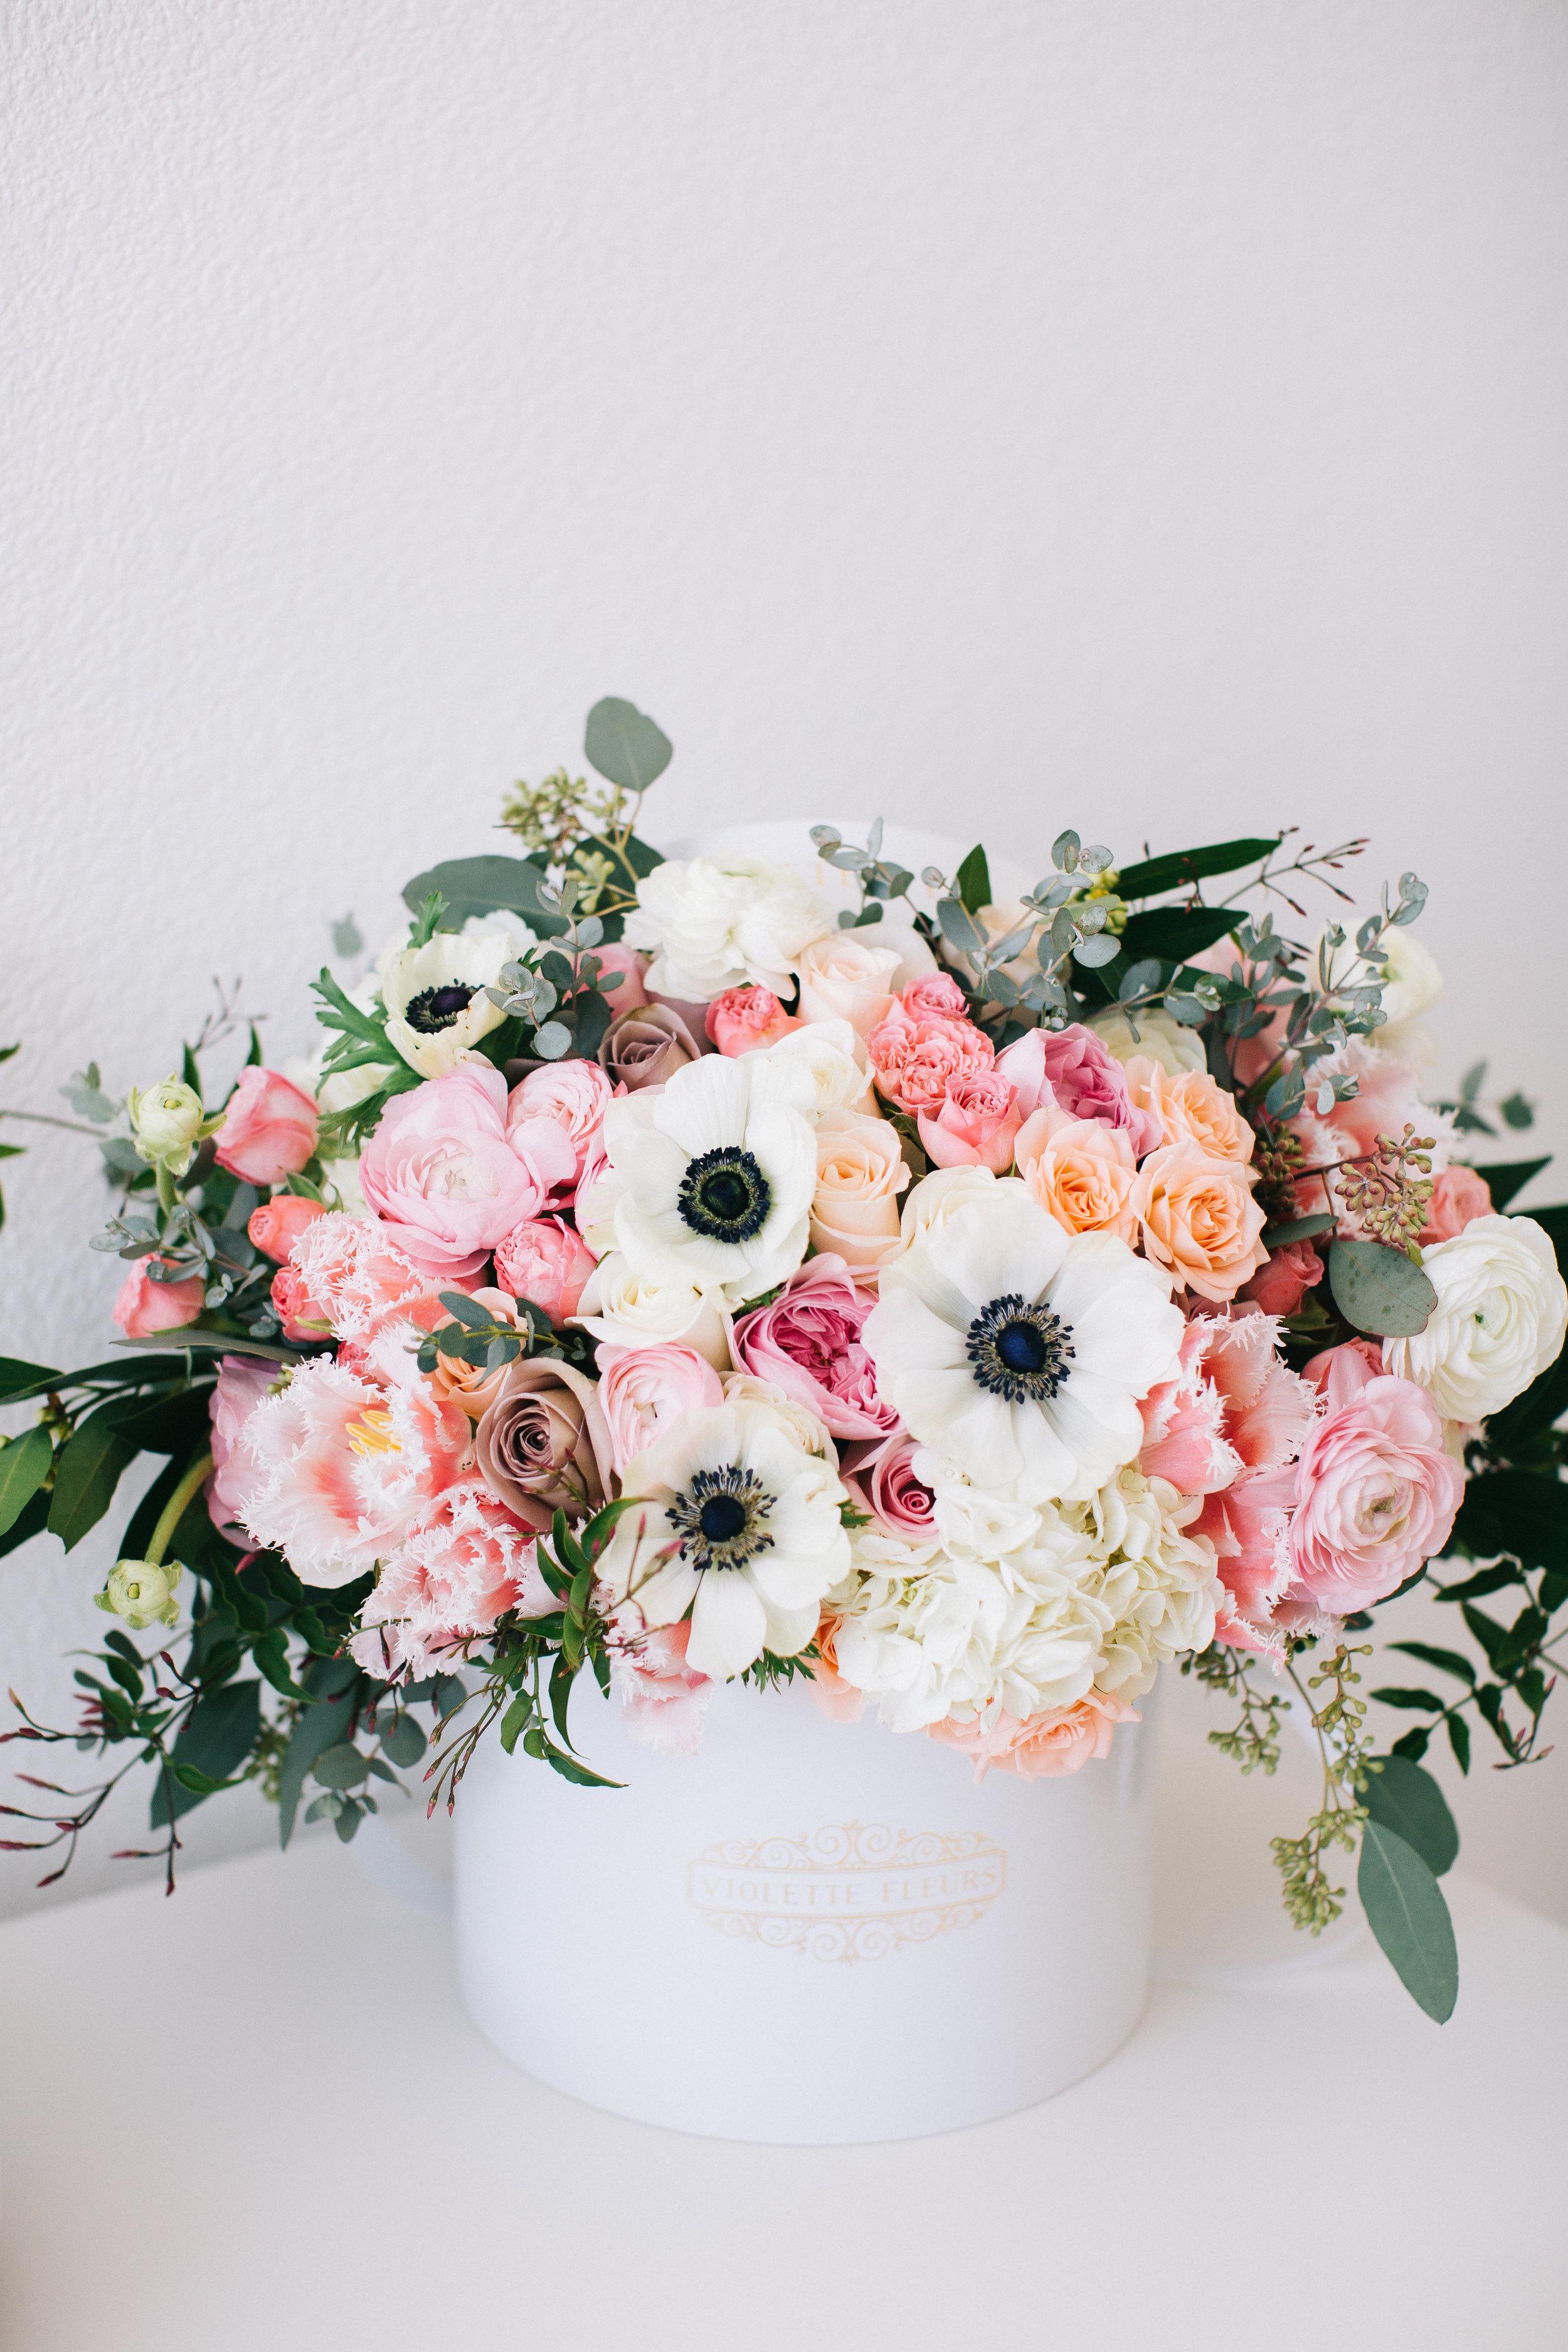 Violette-fleurs-roseville-sacramento-california-anna-perevertaylo-photography-blush-hatbox-flowers.jpg